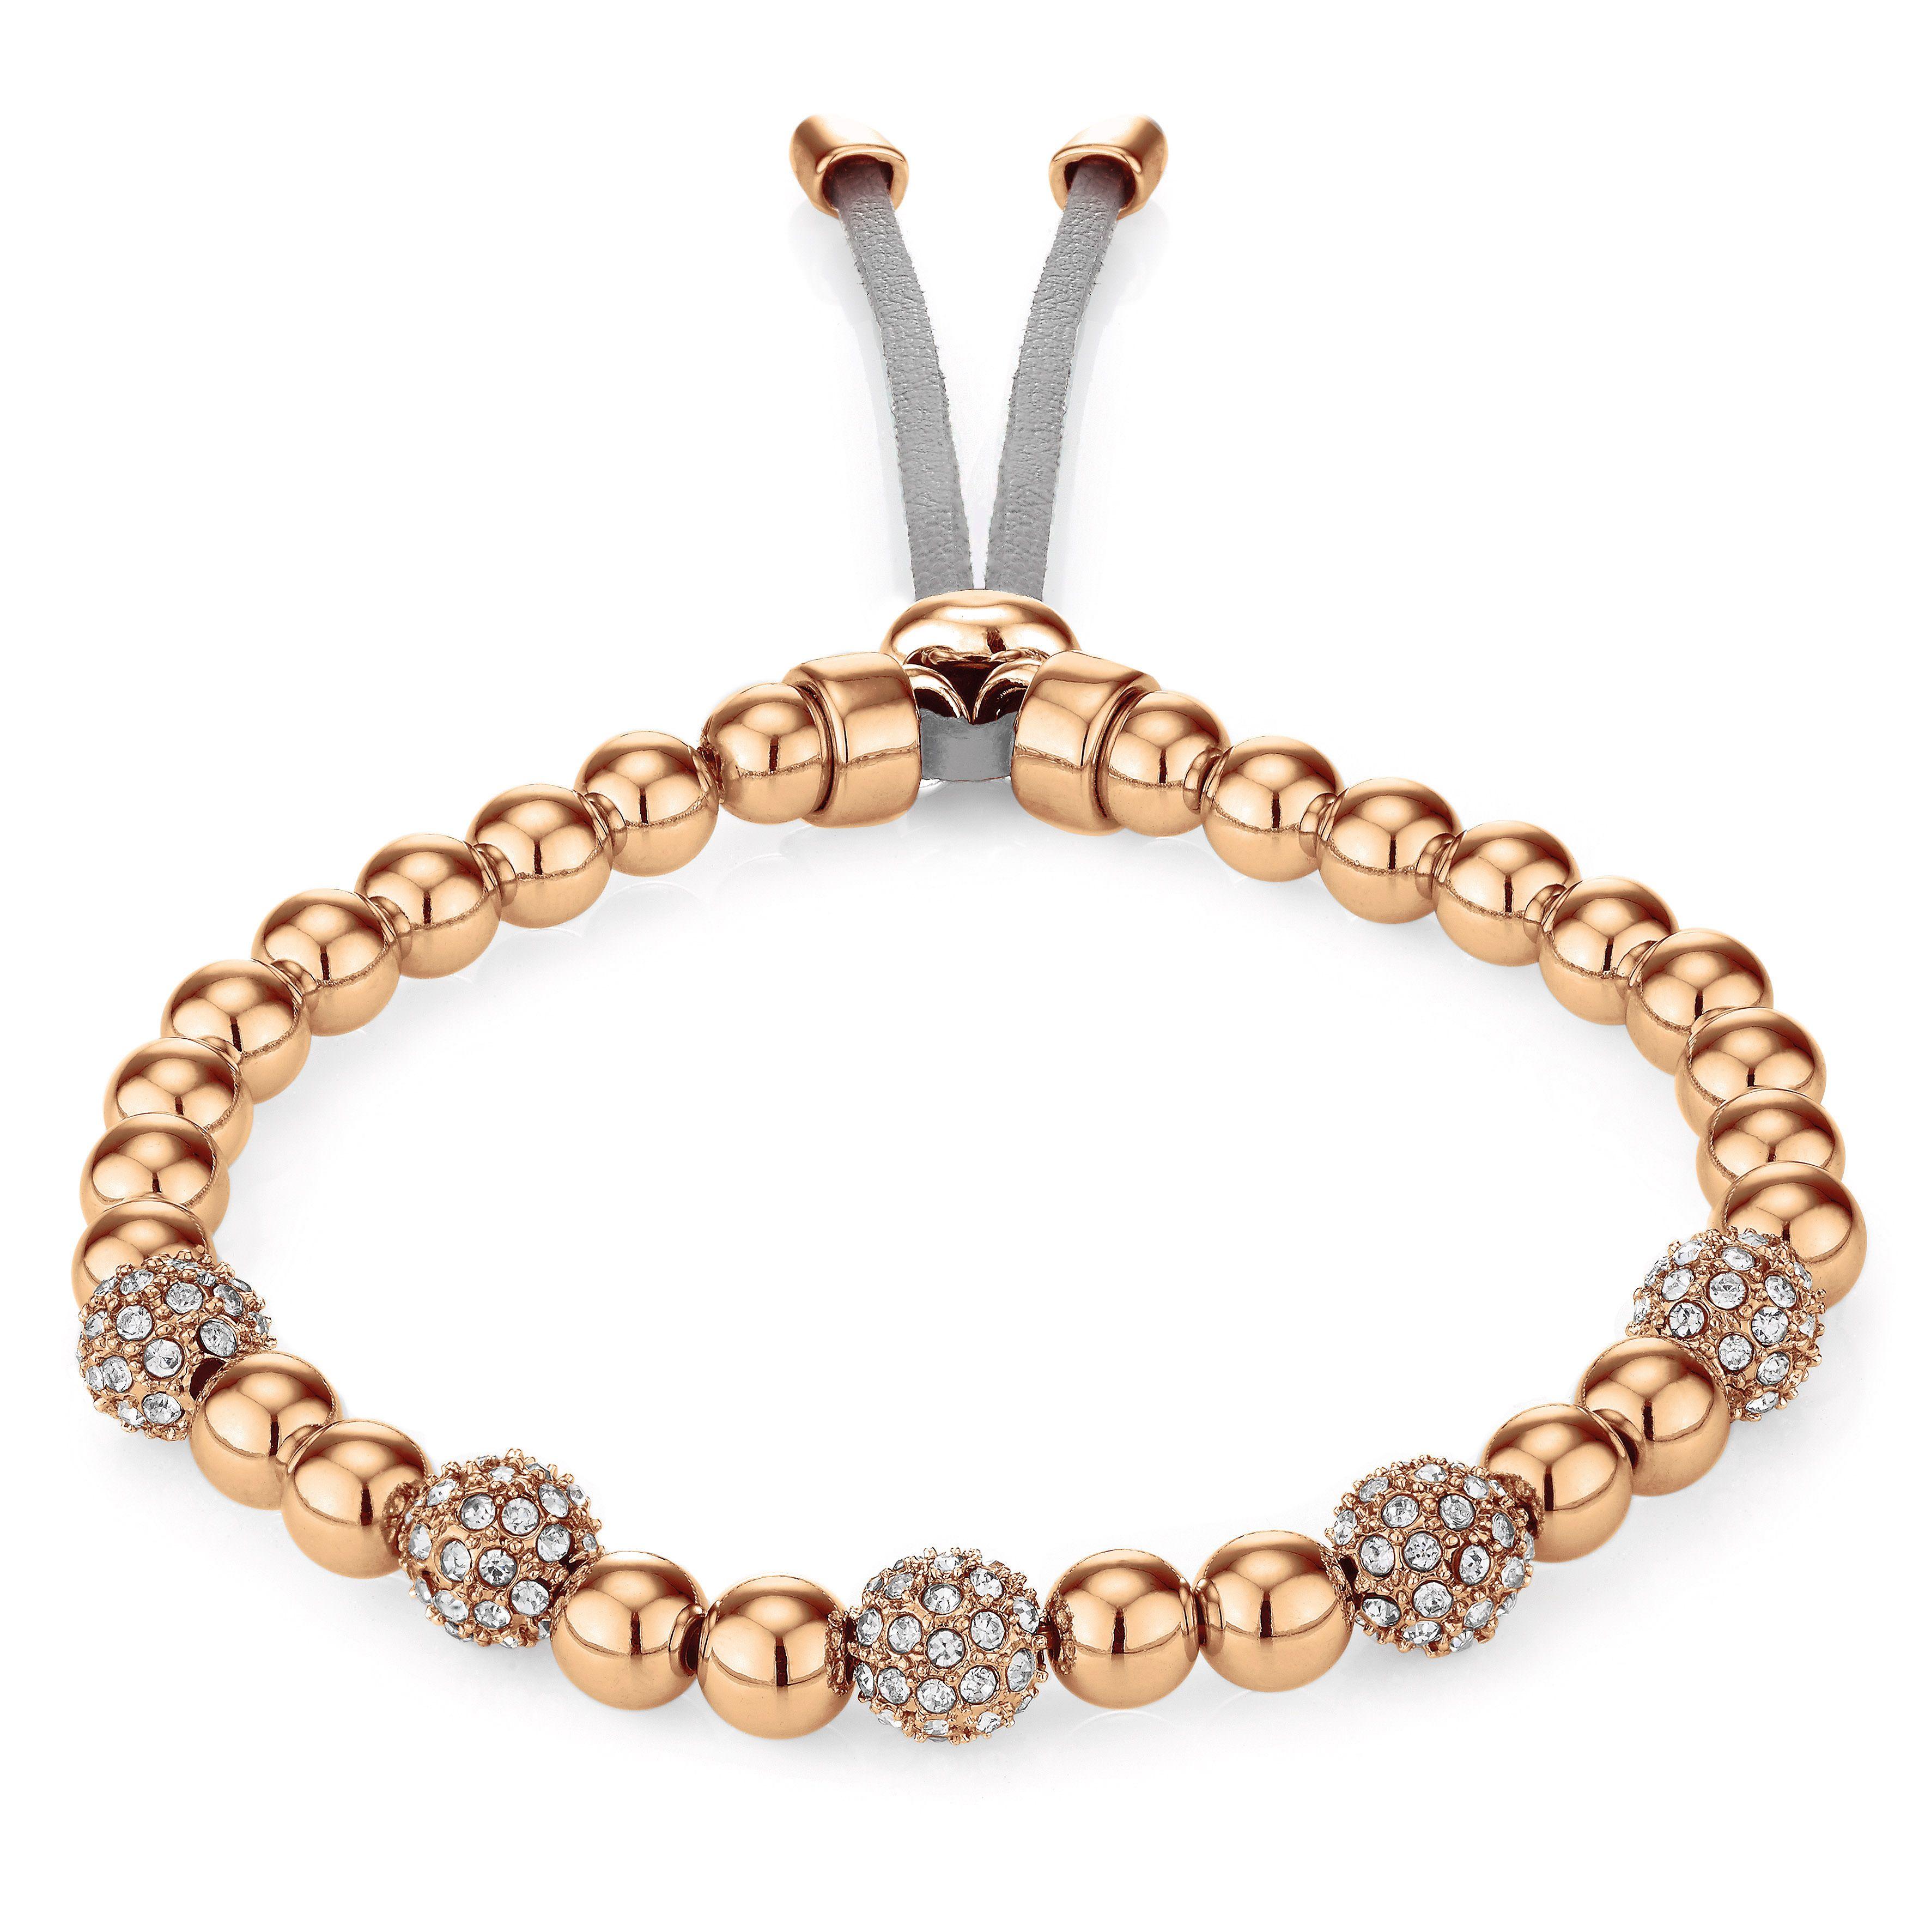 Buckley London Pimlico Bracelet - Rose Gold